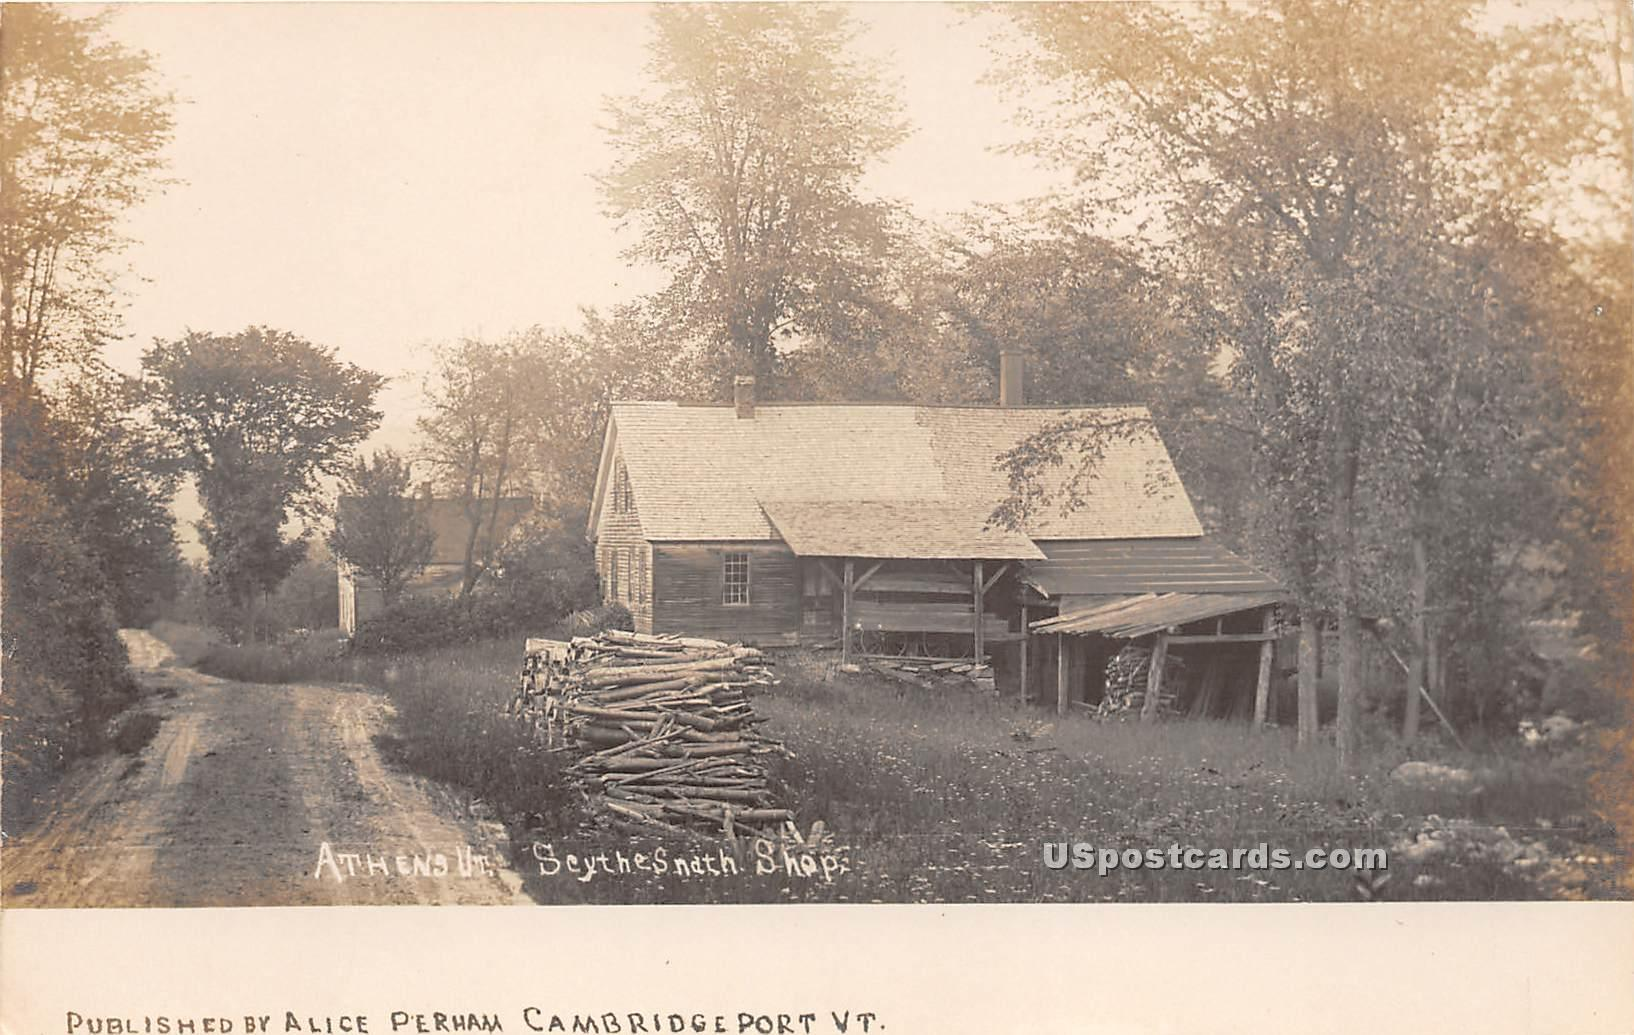 Seythesnath Shop - Athens, Vermont VT Postcard